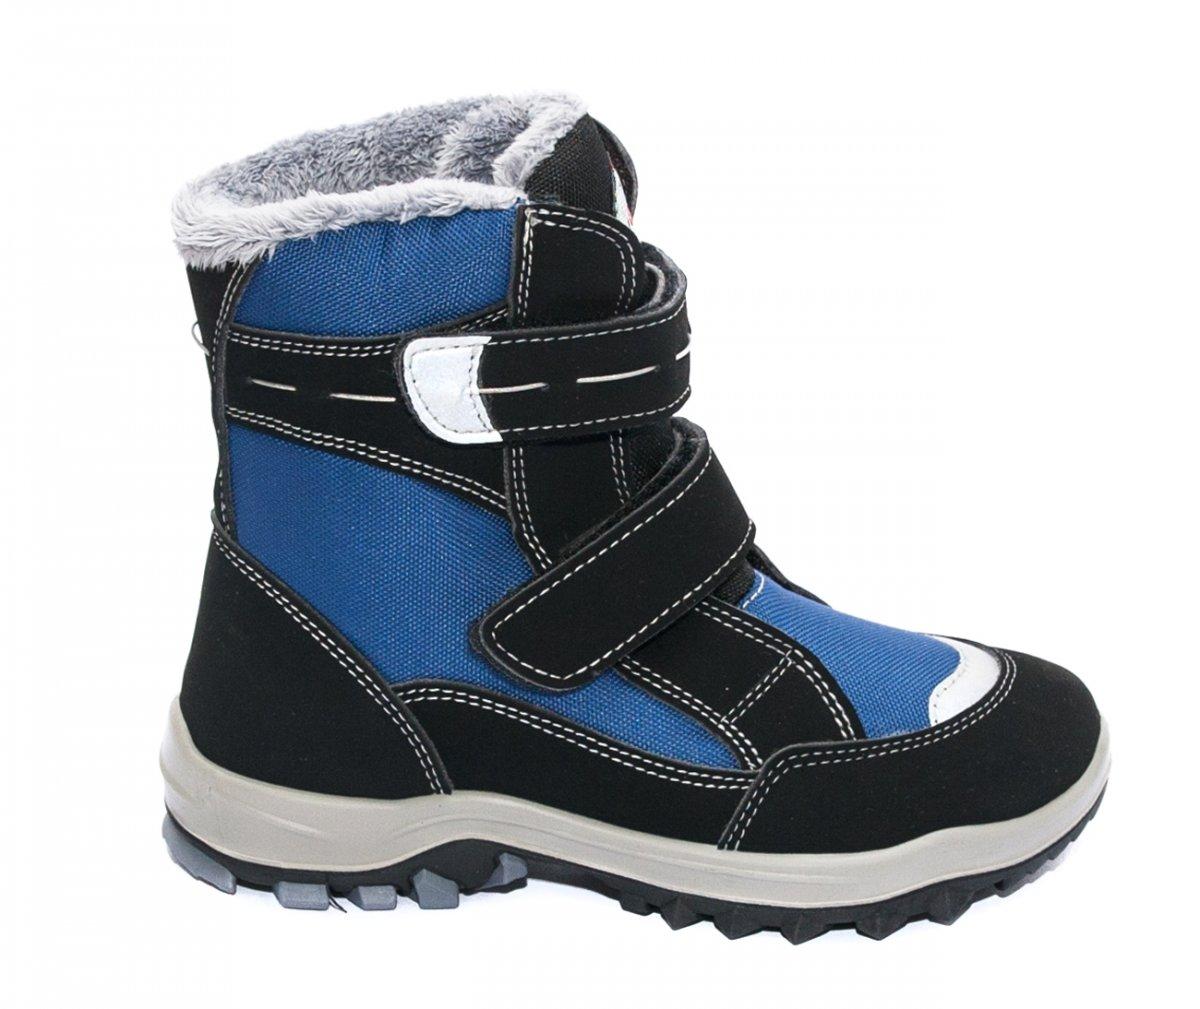 Ghete impermeabile fete gtx 85408 albastru negru 26-35